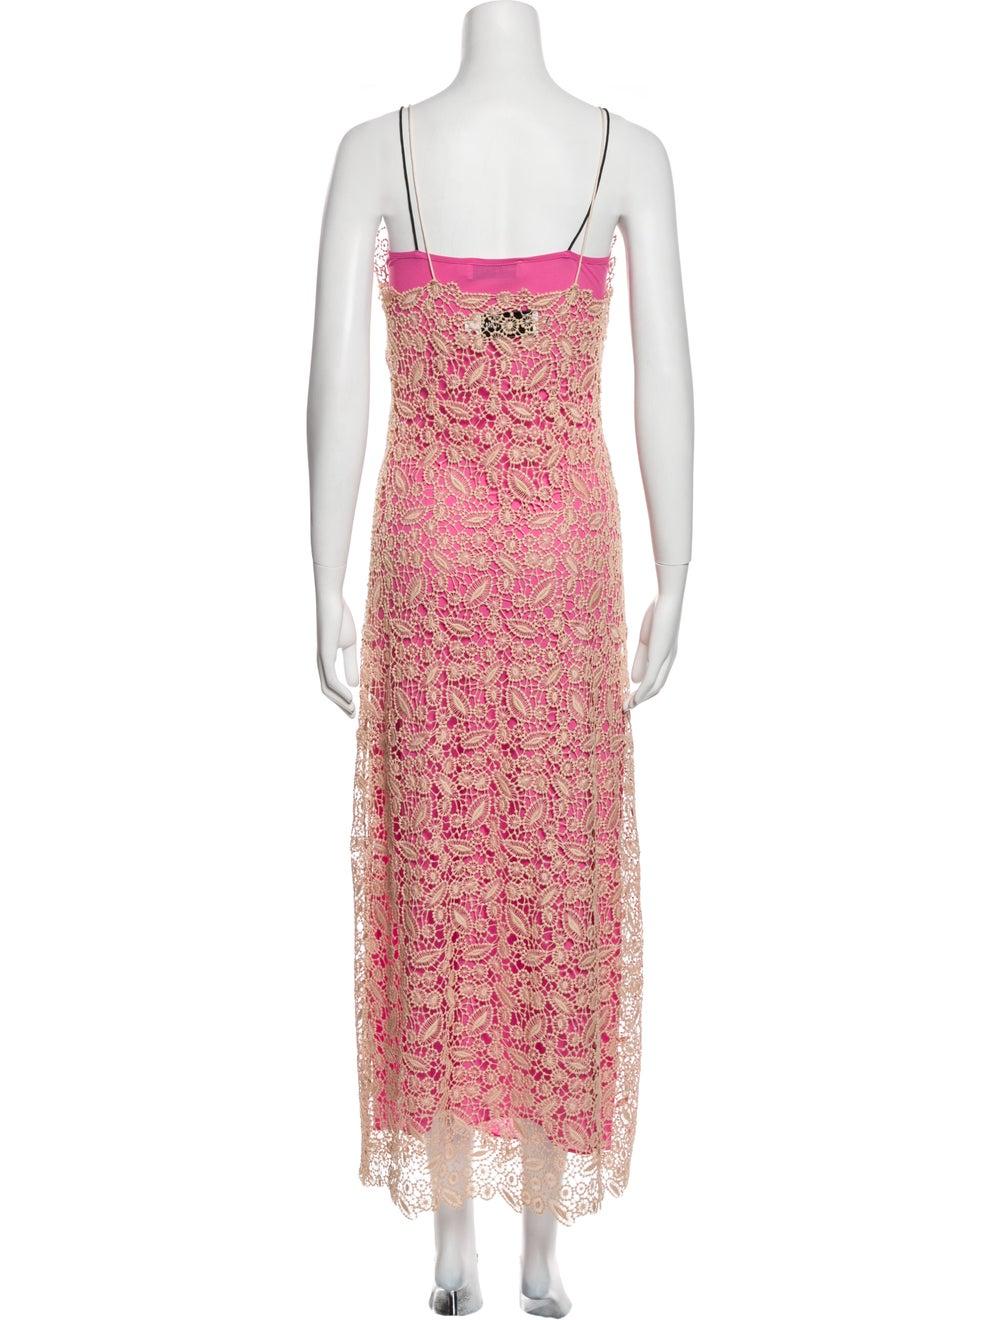 Self-Portrait Lace Pattern Long Dress Pink - image 3